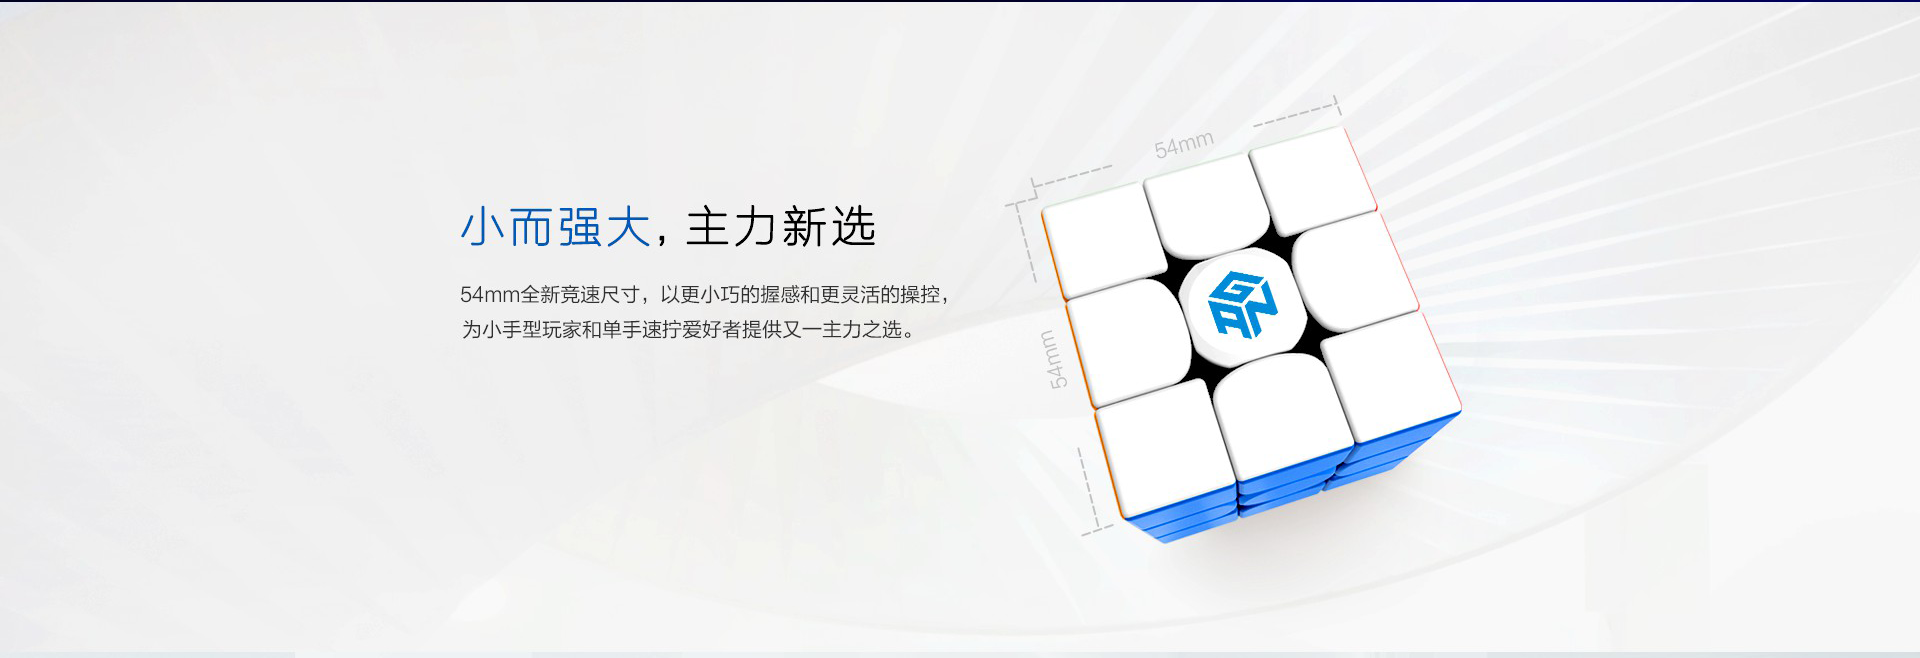 PC-354-M-详情_02